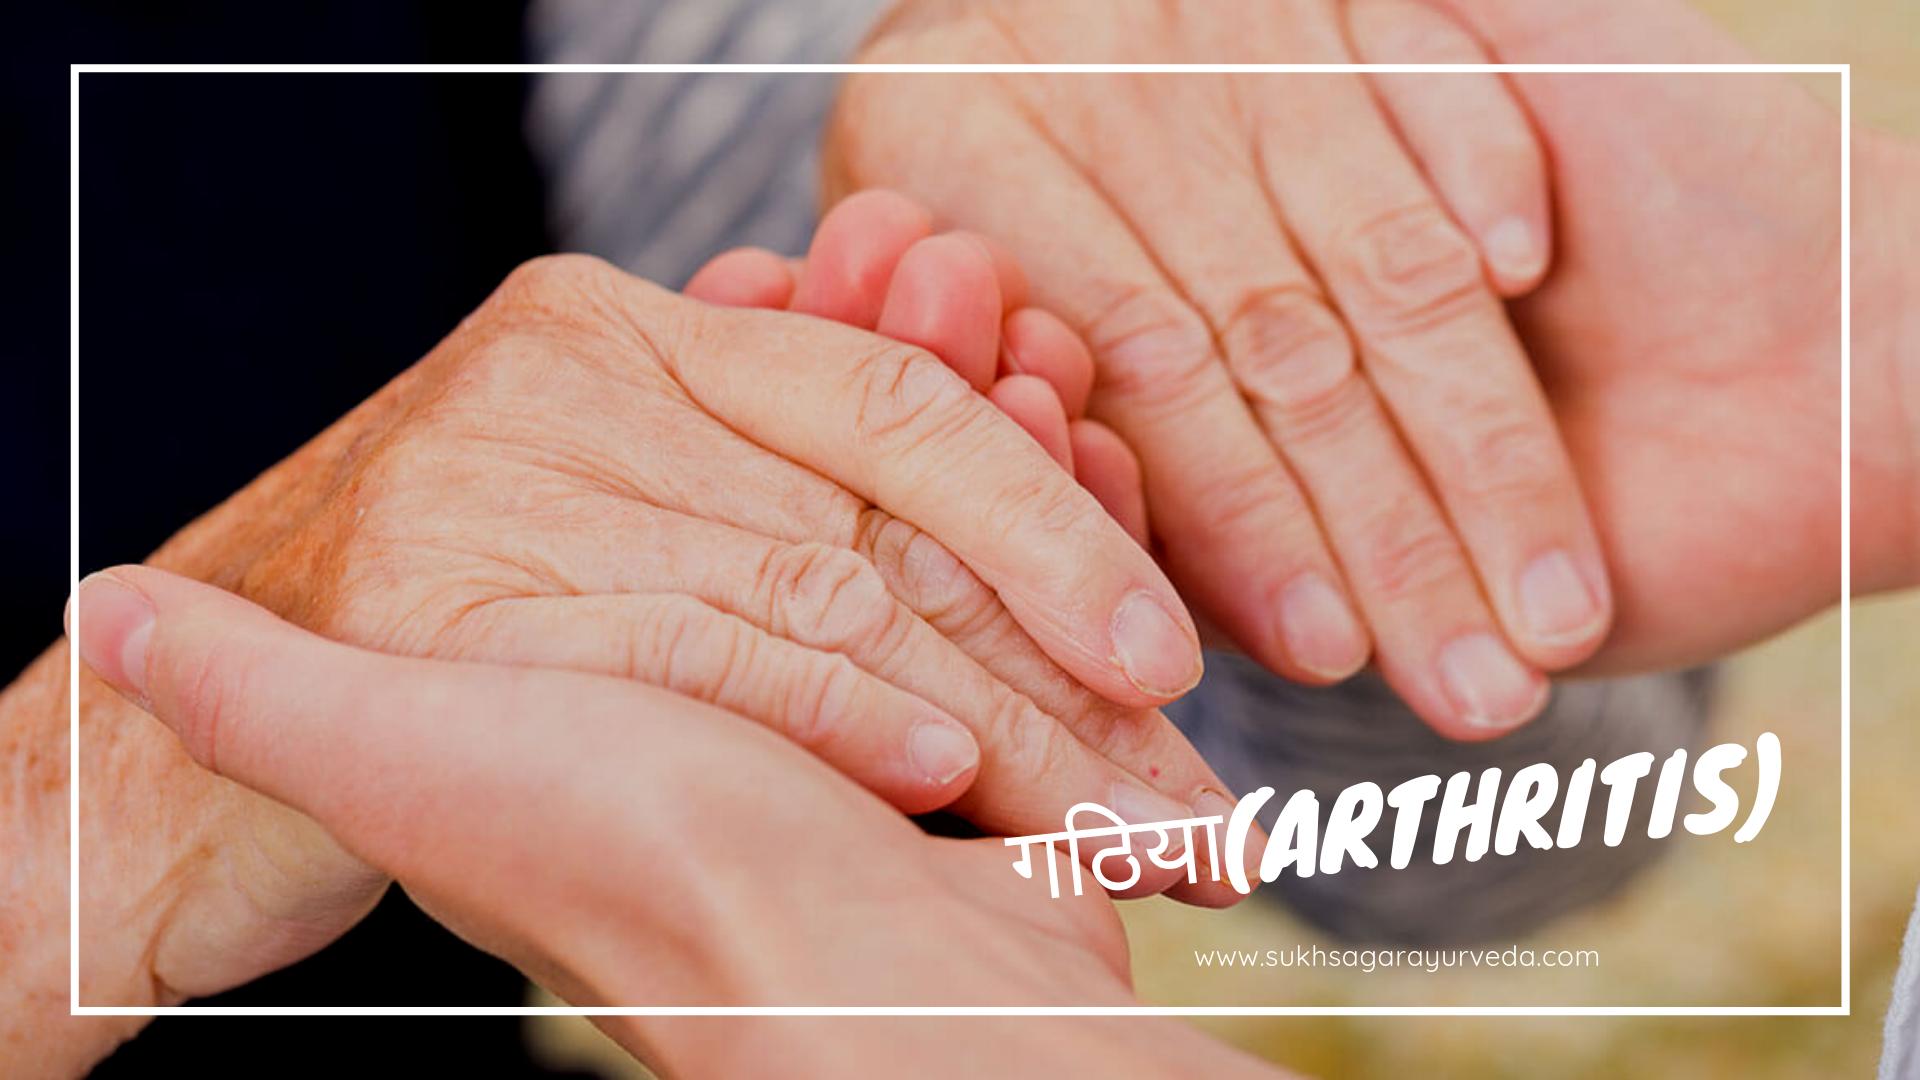 गठियाarthritis-का-सम्पूर्ण-इलाज